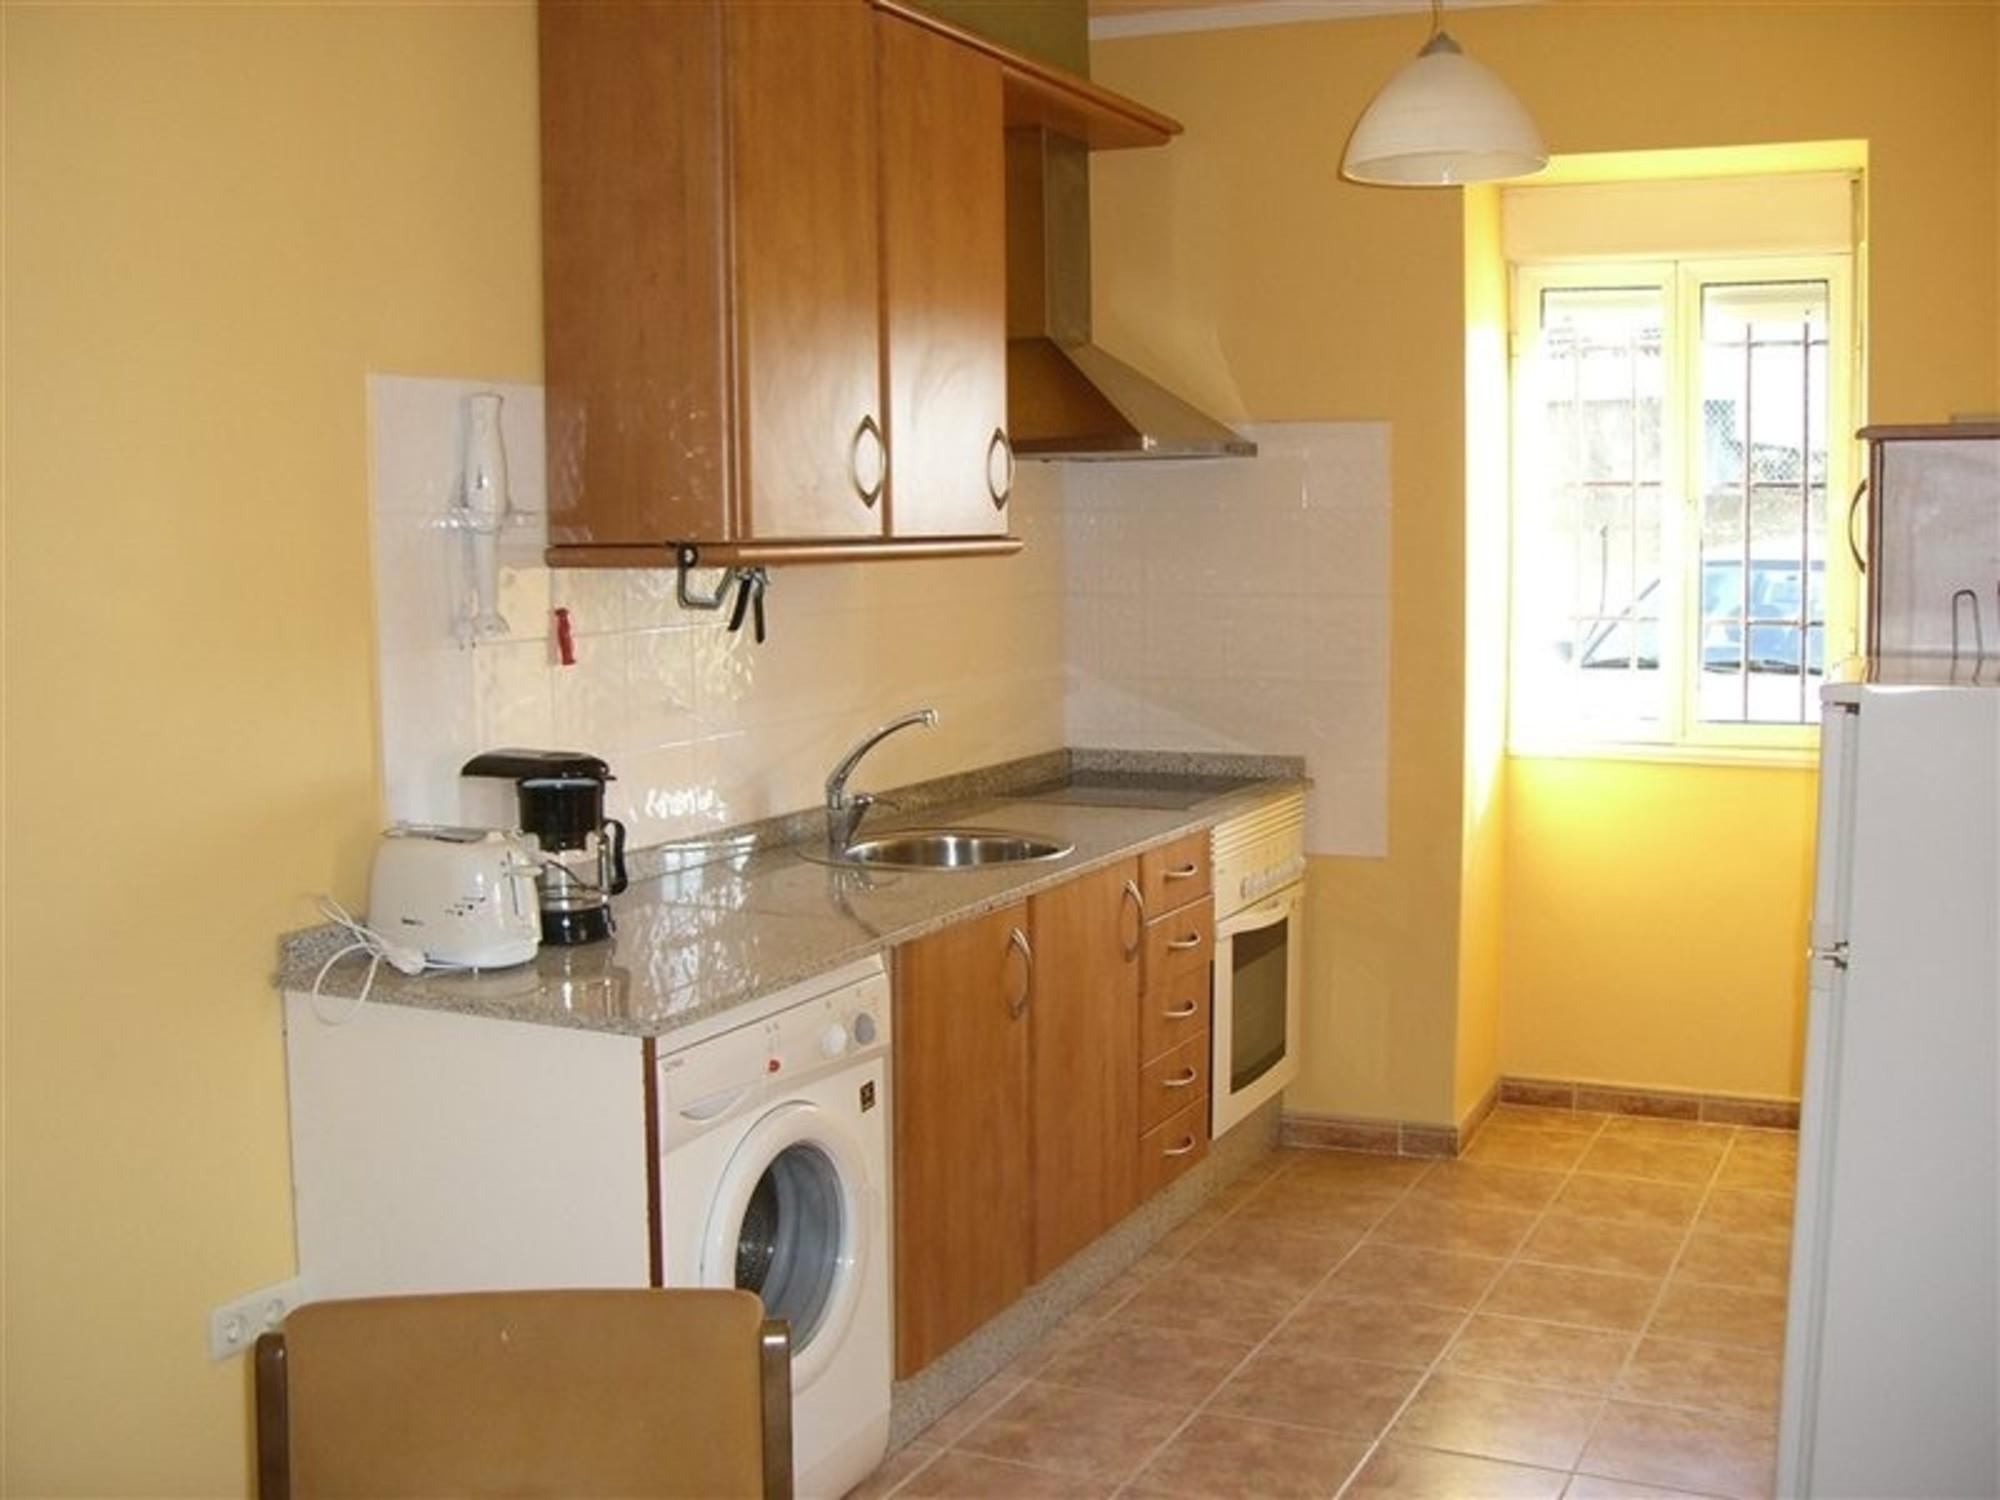 Ferienwohnung Apartment - 2 Bedrooms - 100119 (1937591), Vigo, Rias Bajas, Galicien, Spanien, Bild 5